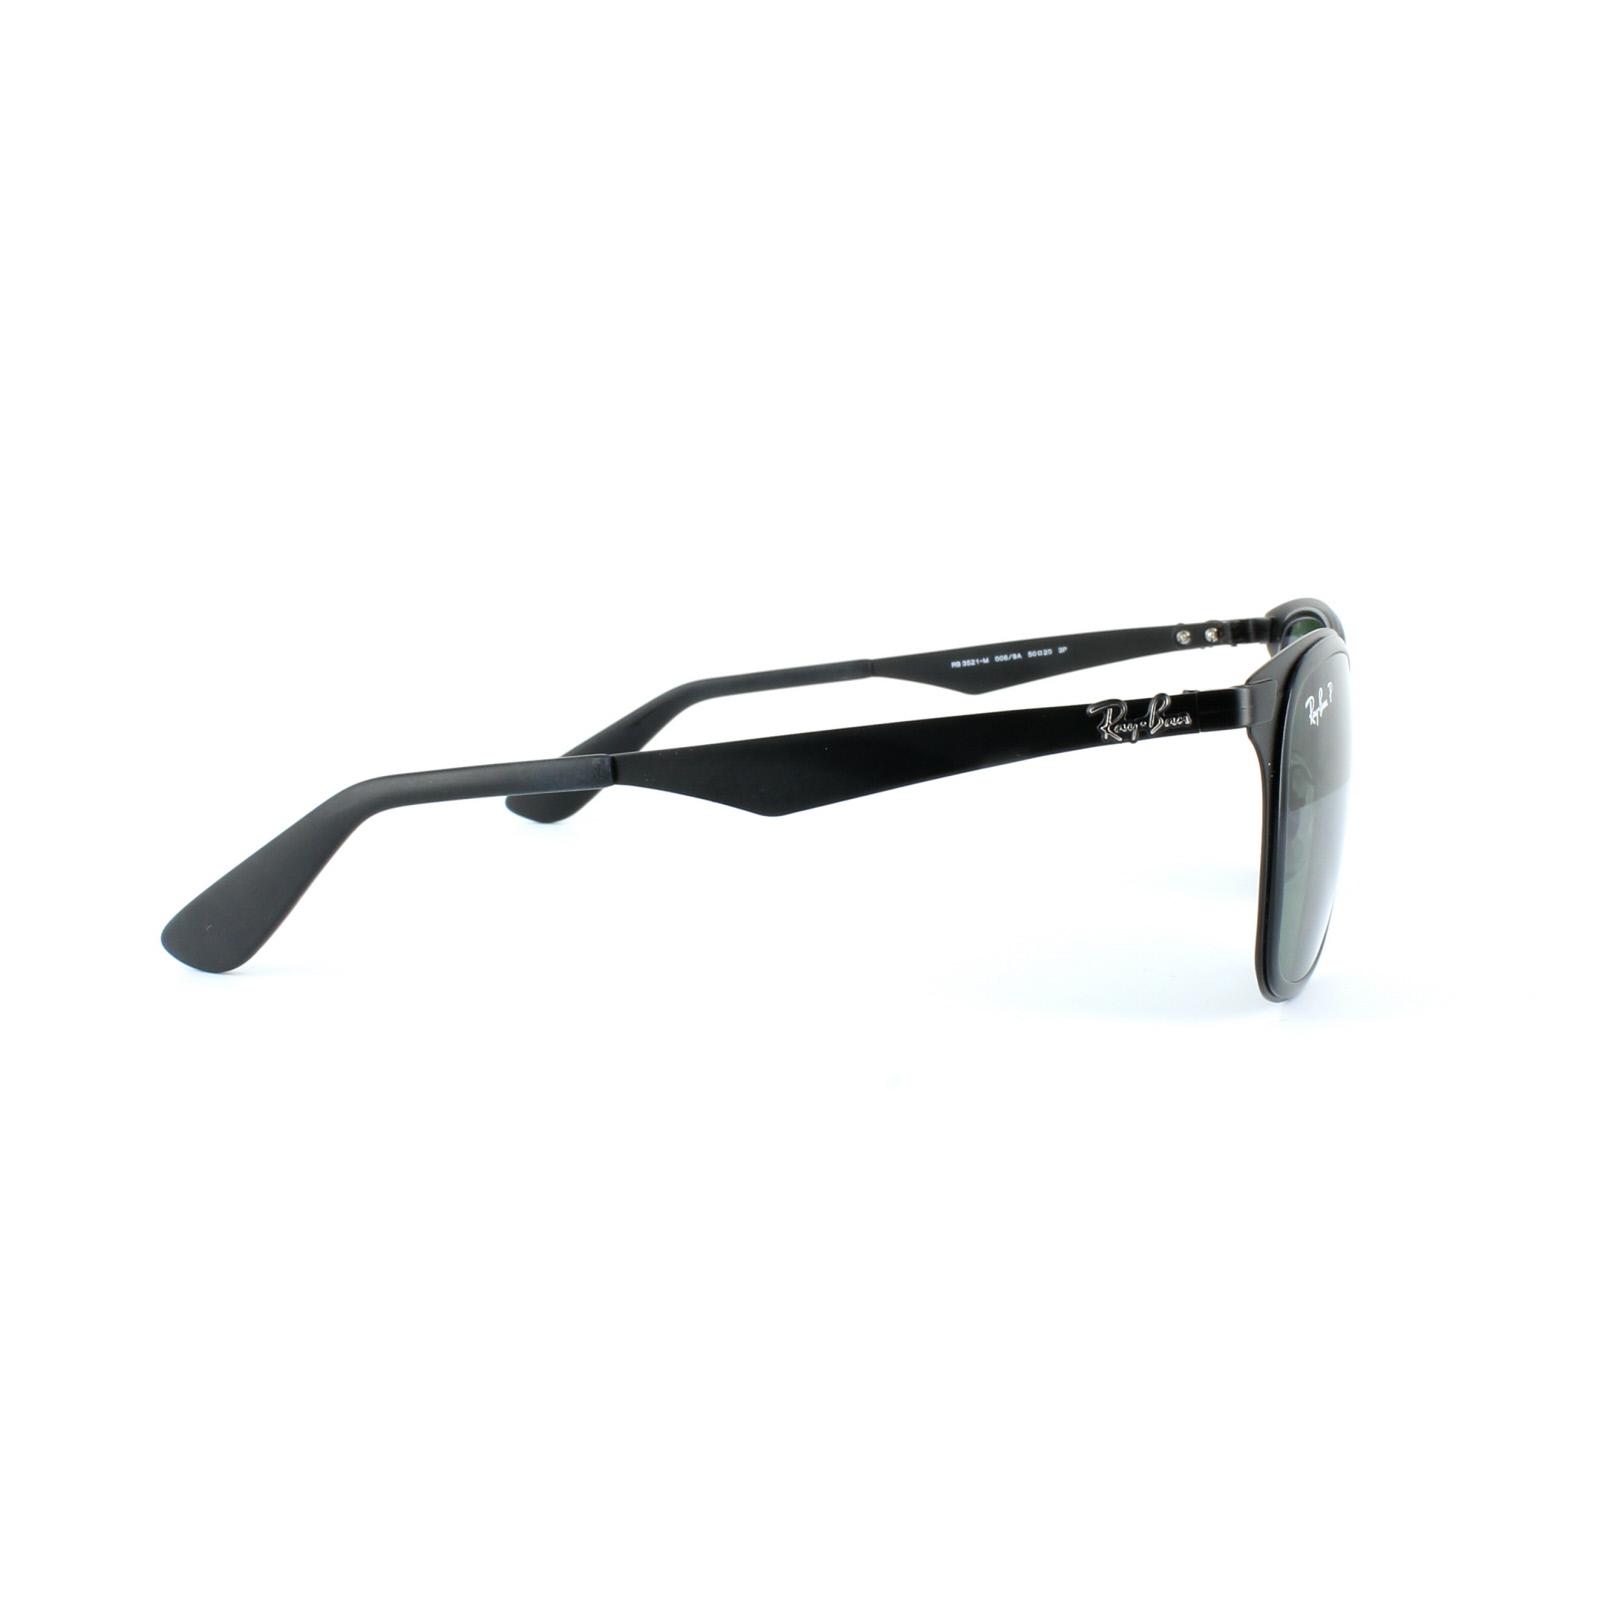 29b8799a90f87 ... discount sentinel ray ban sunglasses wayfarer flat metal 3521 006 9a  black green polarized 8b836 1def2